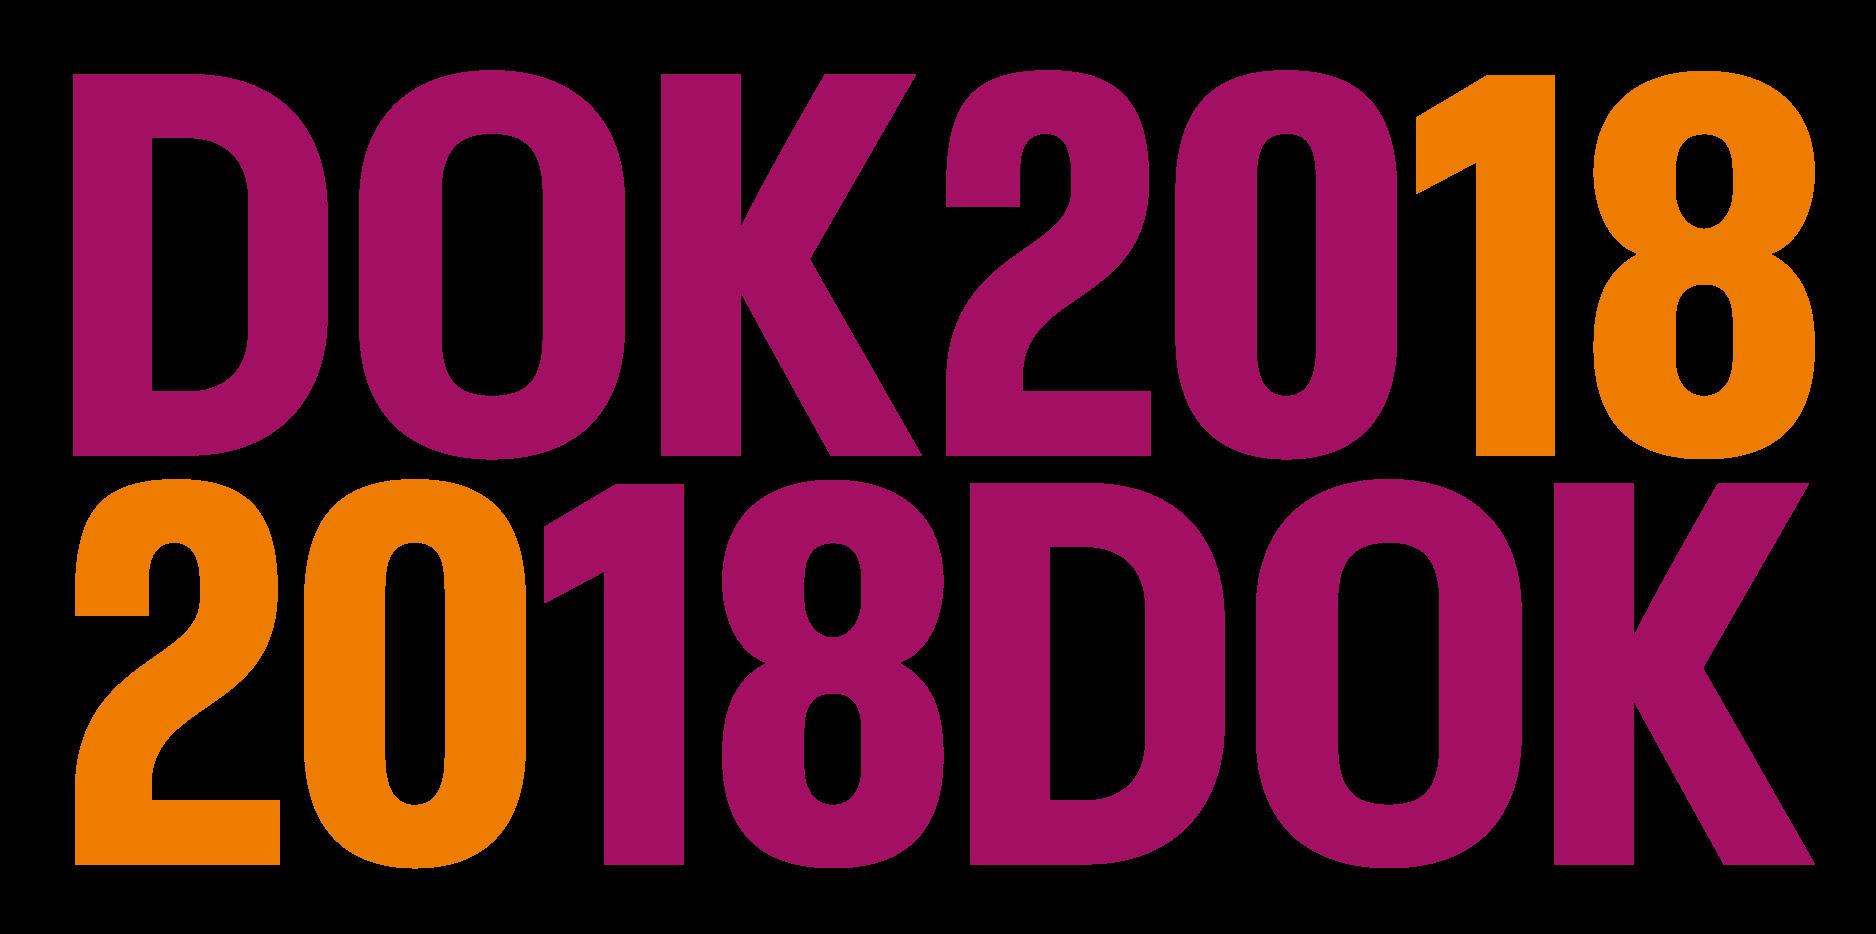 Dokdag 2018 logo